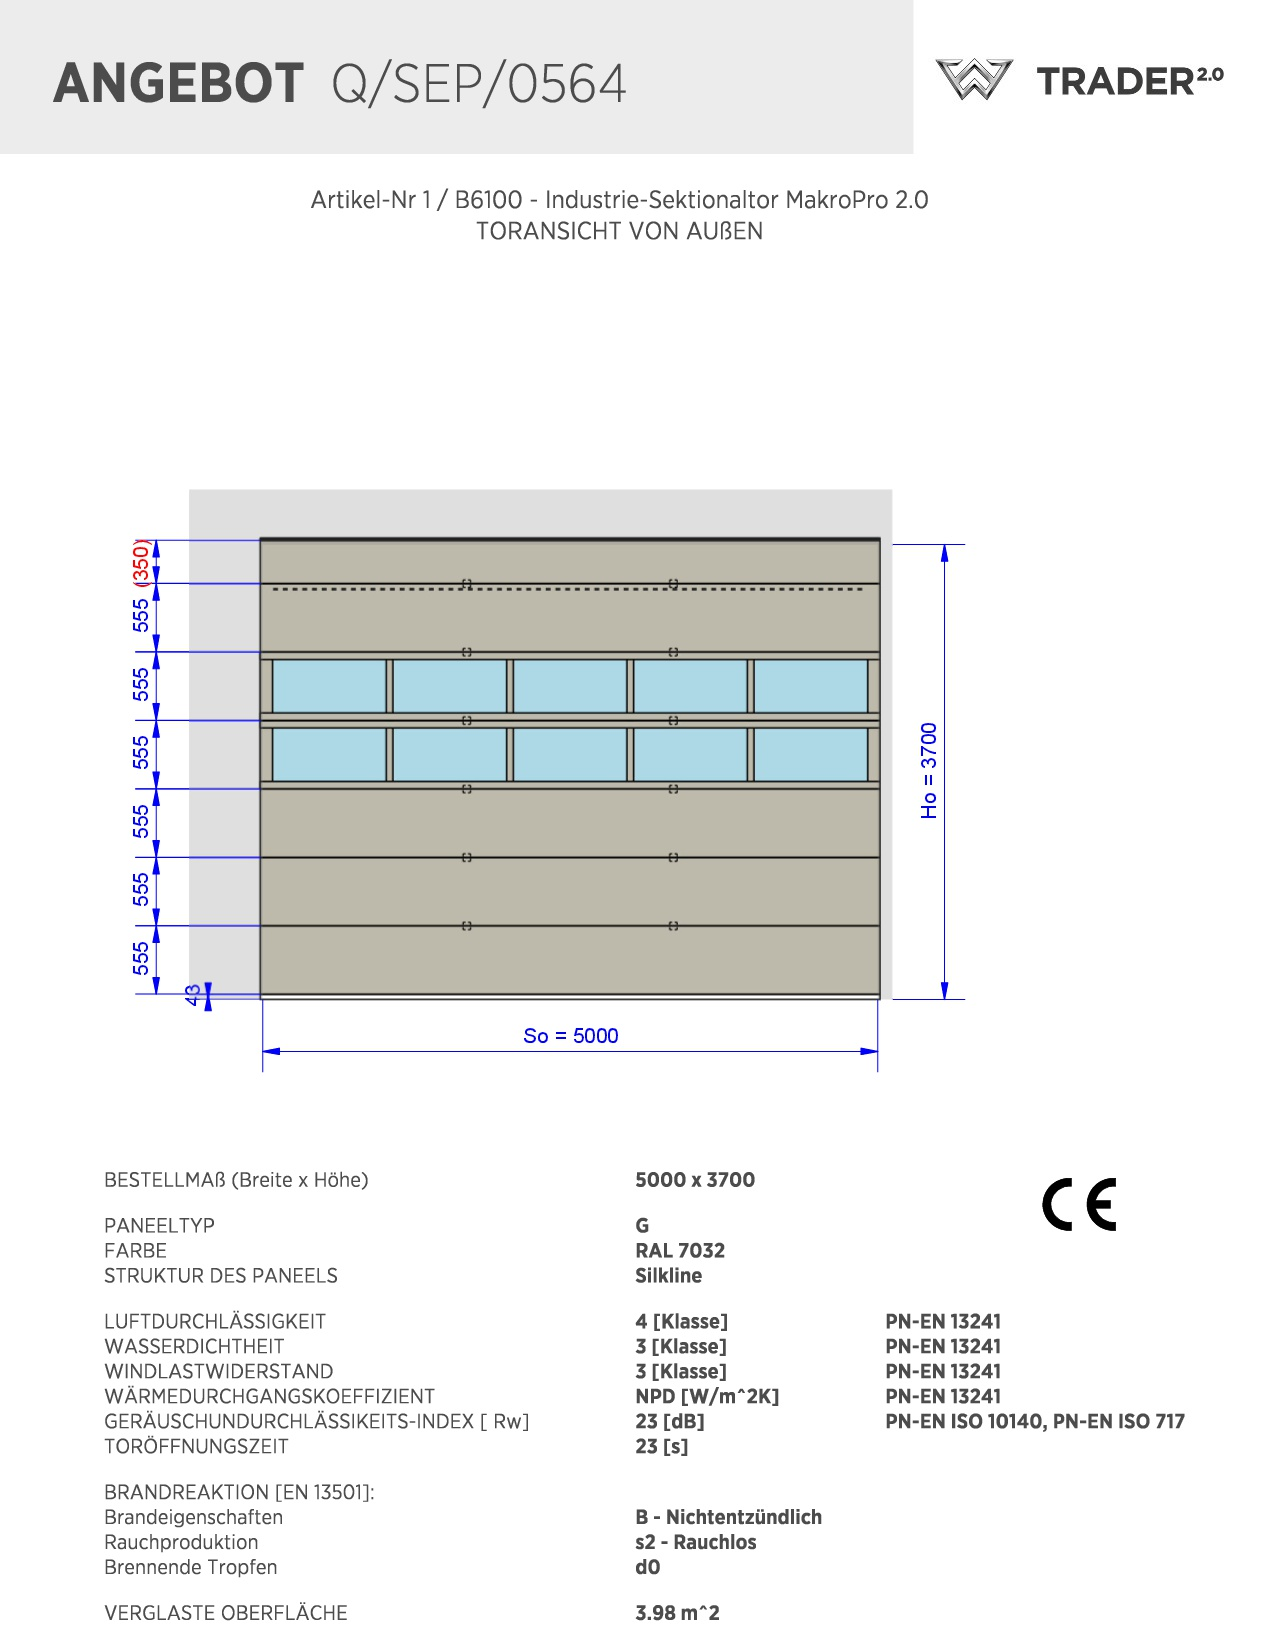 Industrietor - MakroPro